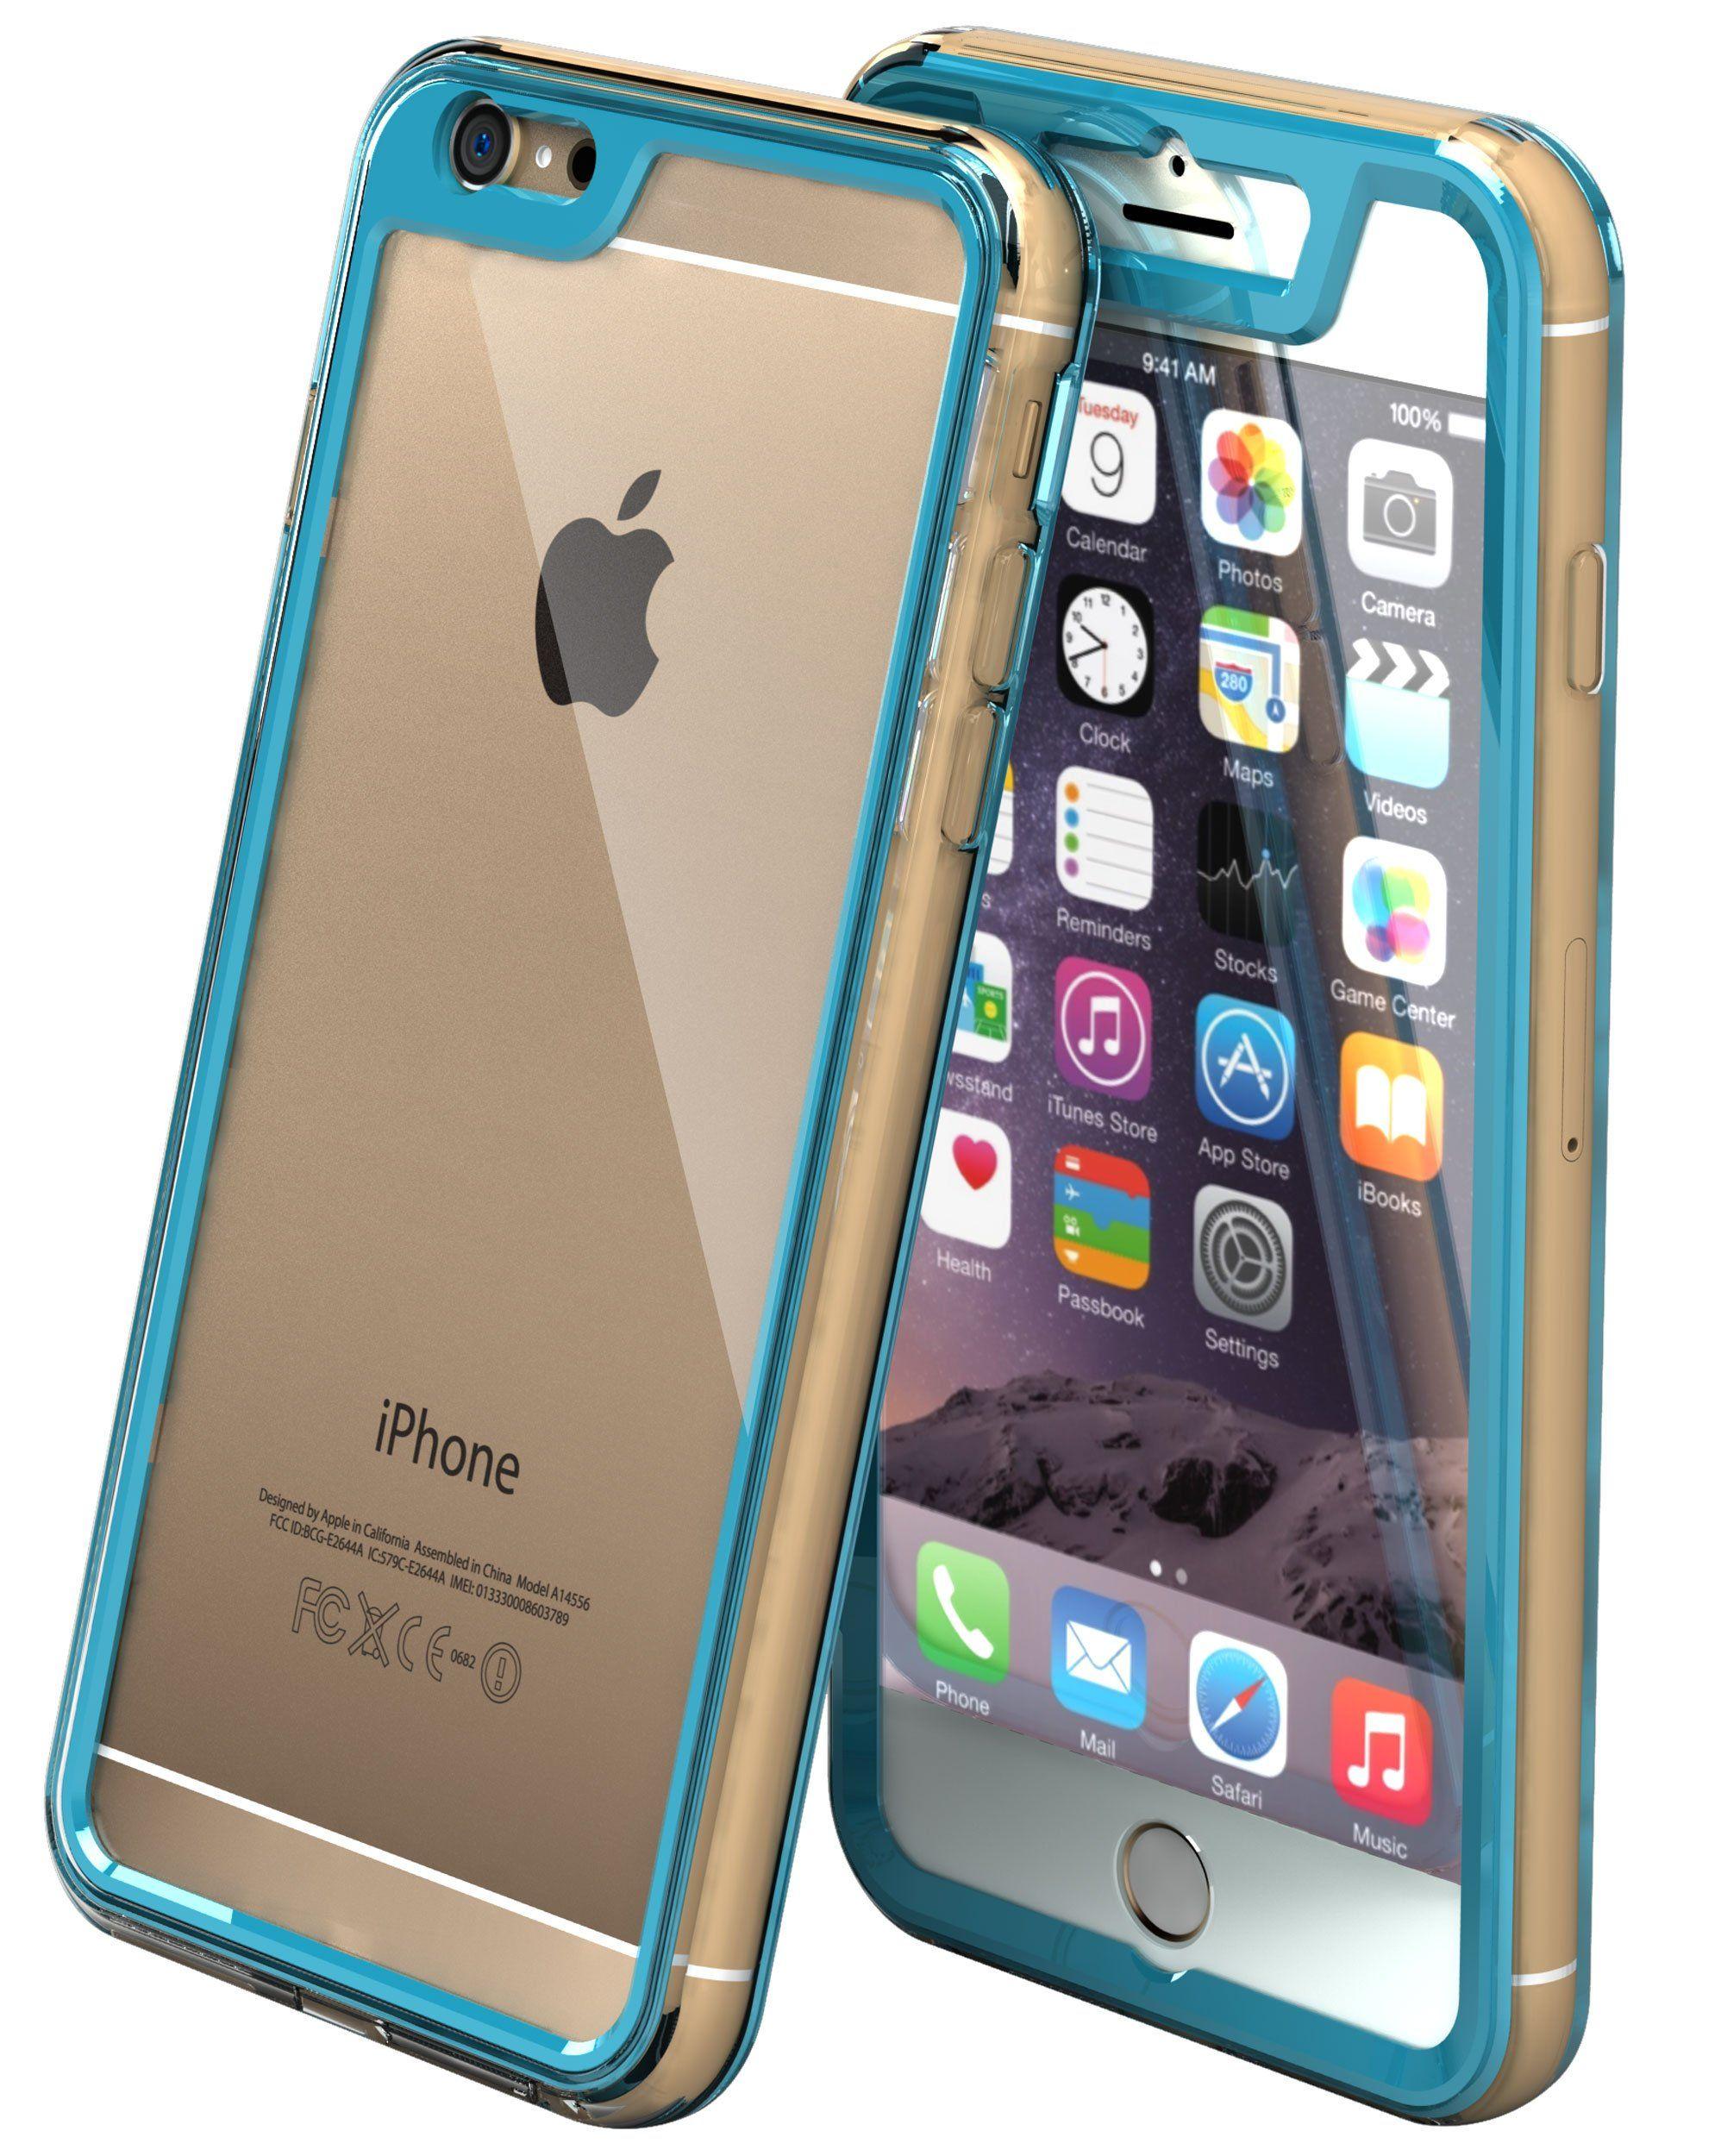 hot sales 9b2e2 cf2c6 roocase iPhone 6 Plus Case, Gelledge Premium Hybrid PC / TPU ...